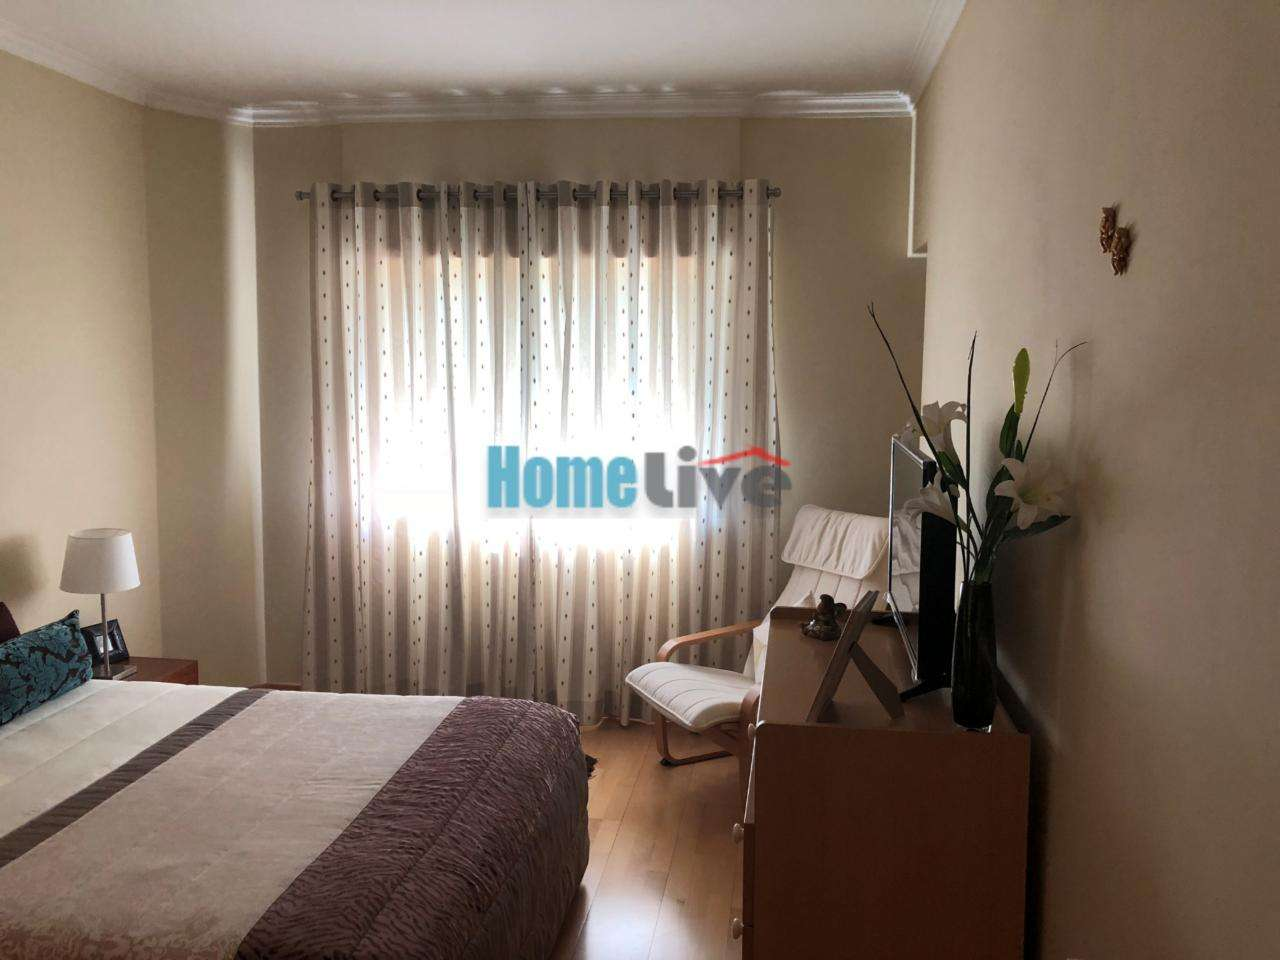 Apartamento para comprar, Póvoa de Santa Iria e Forte da Casa, Vila Franca de Xira, Lisboa - Foto 22